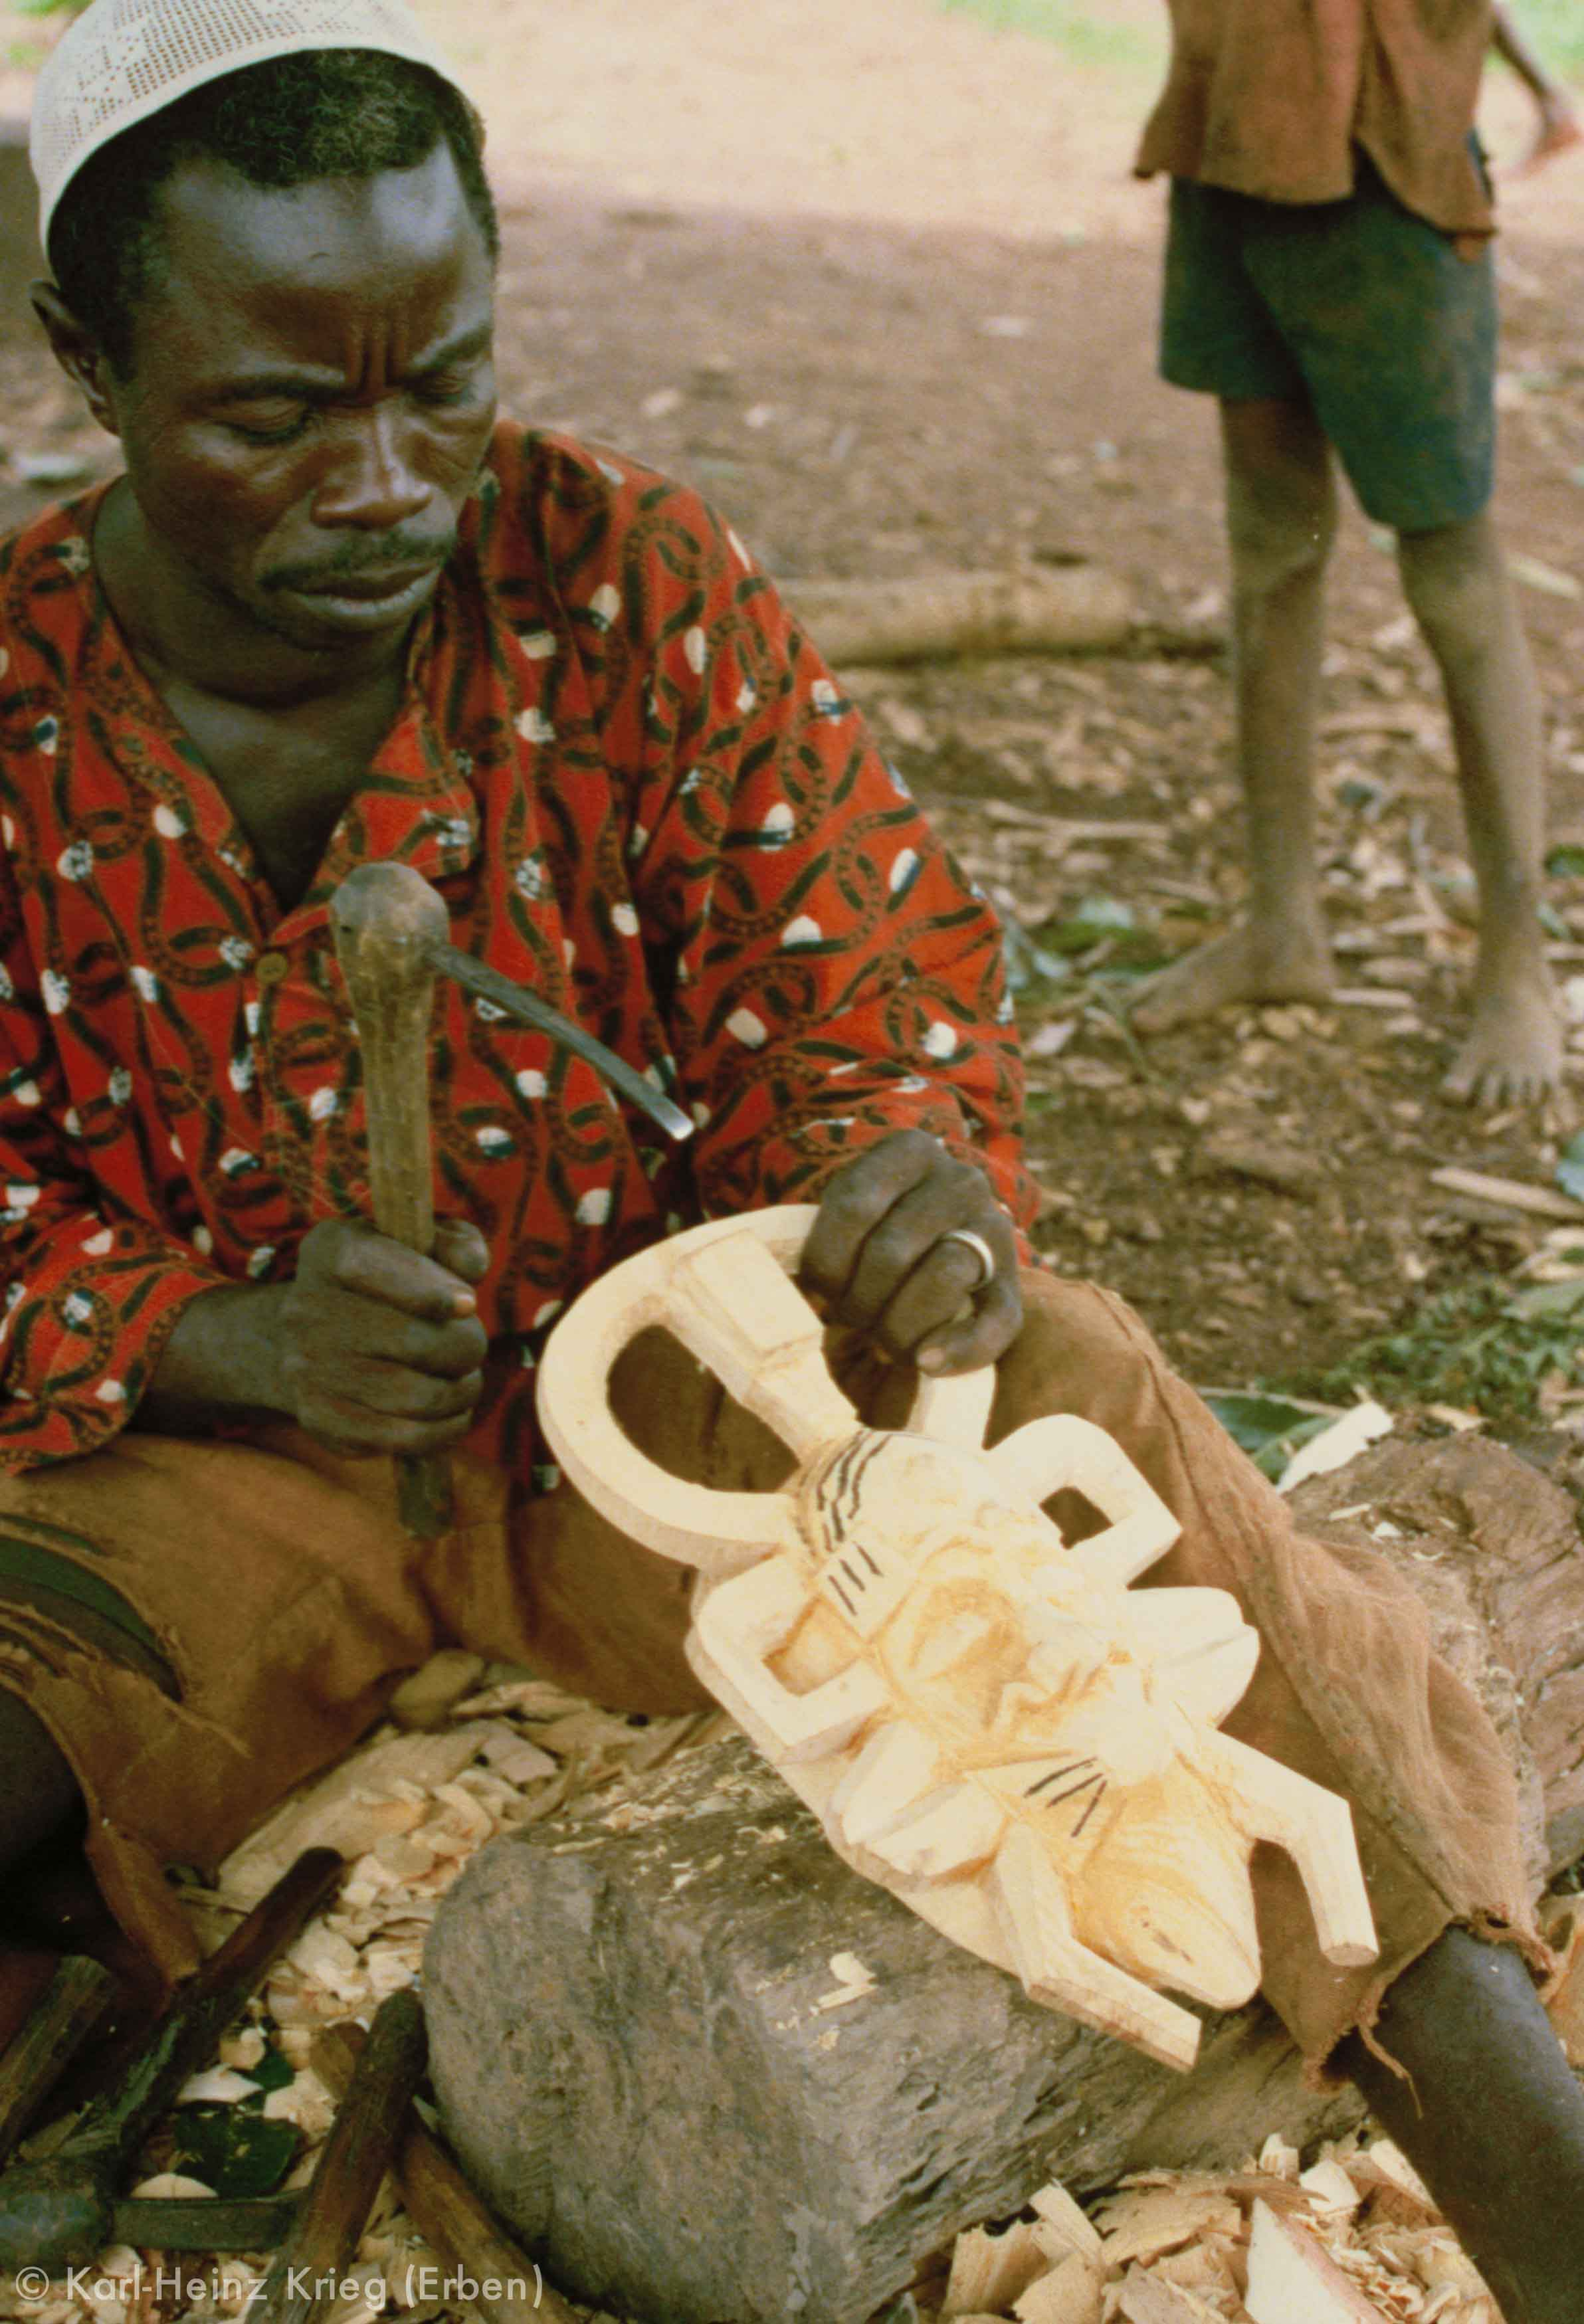 Sécondjéwin Dagnogo carving a mask with an adze. Ziédougou (Region of Boundiali, Côte d'Ivoire), 1980.Photo: Karl-Heinz Krieg